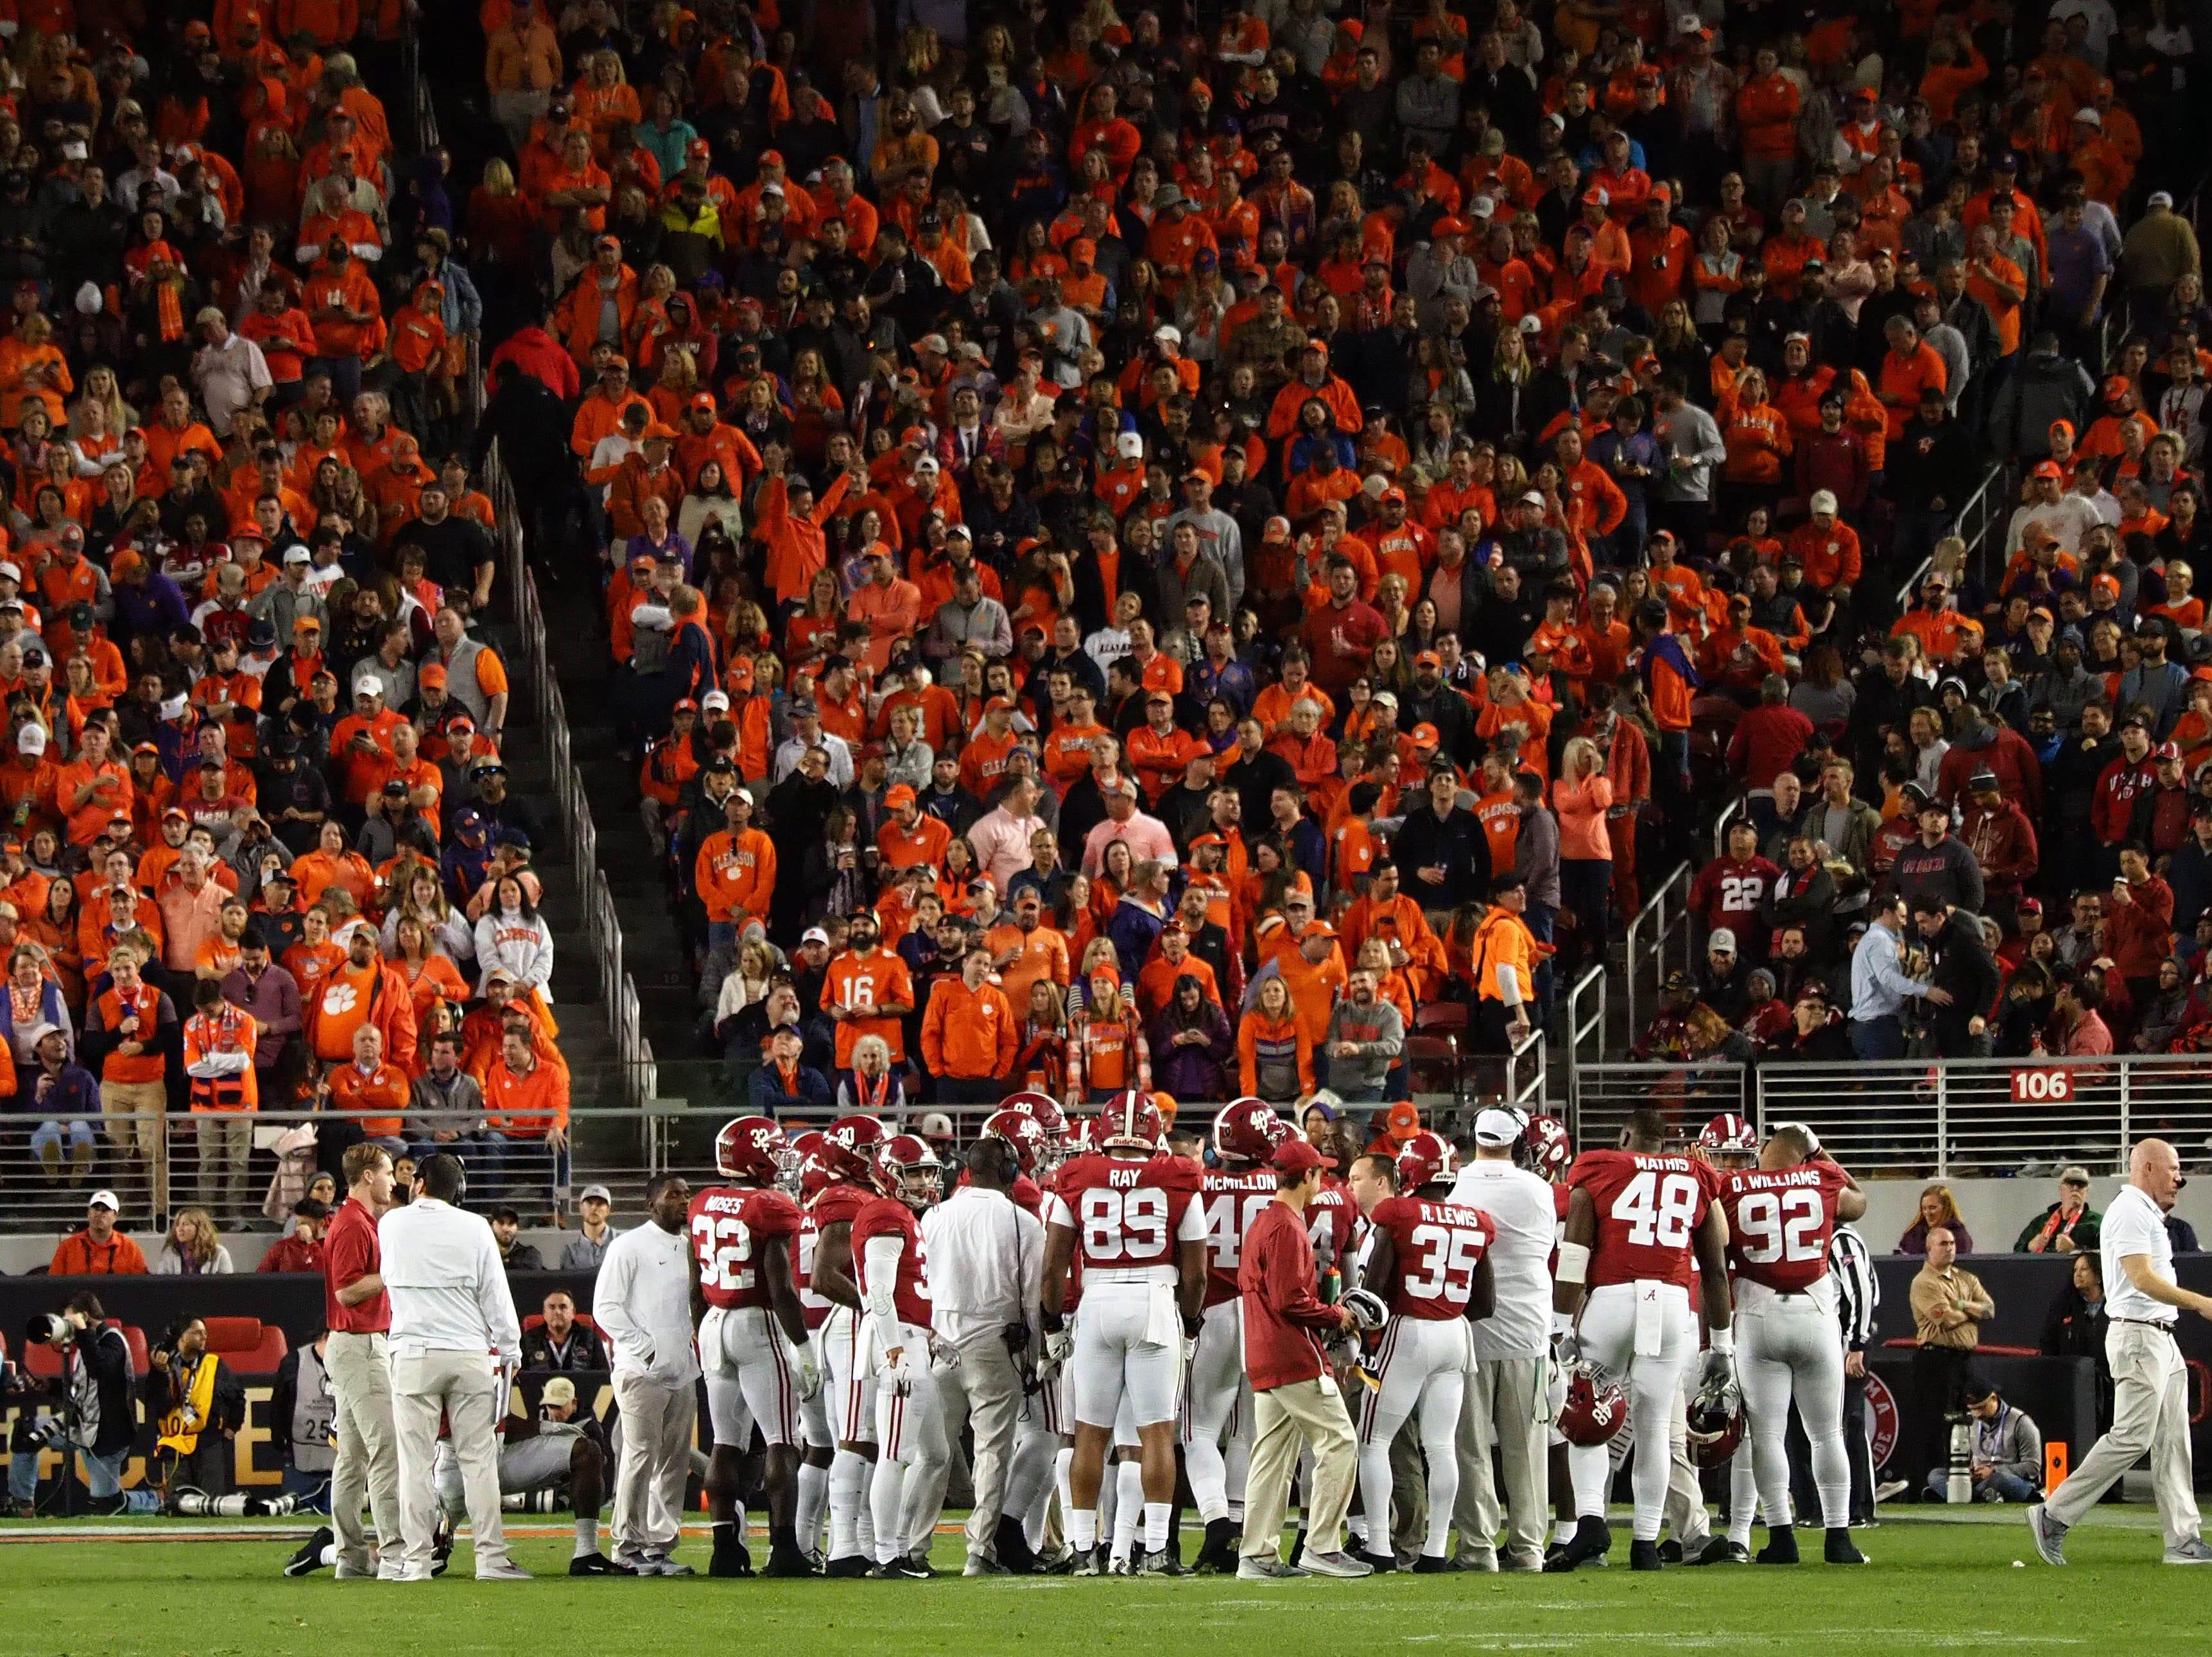 Clemson fans look on during an Alabama huddle.